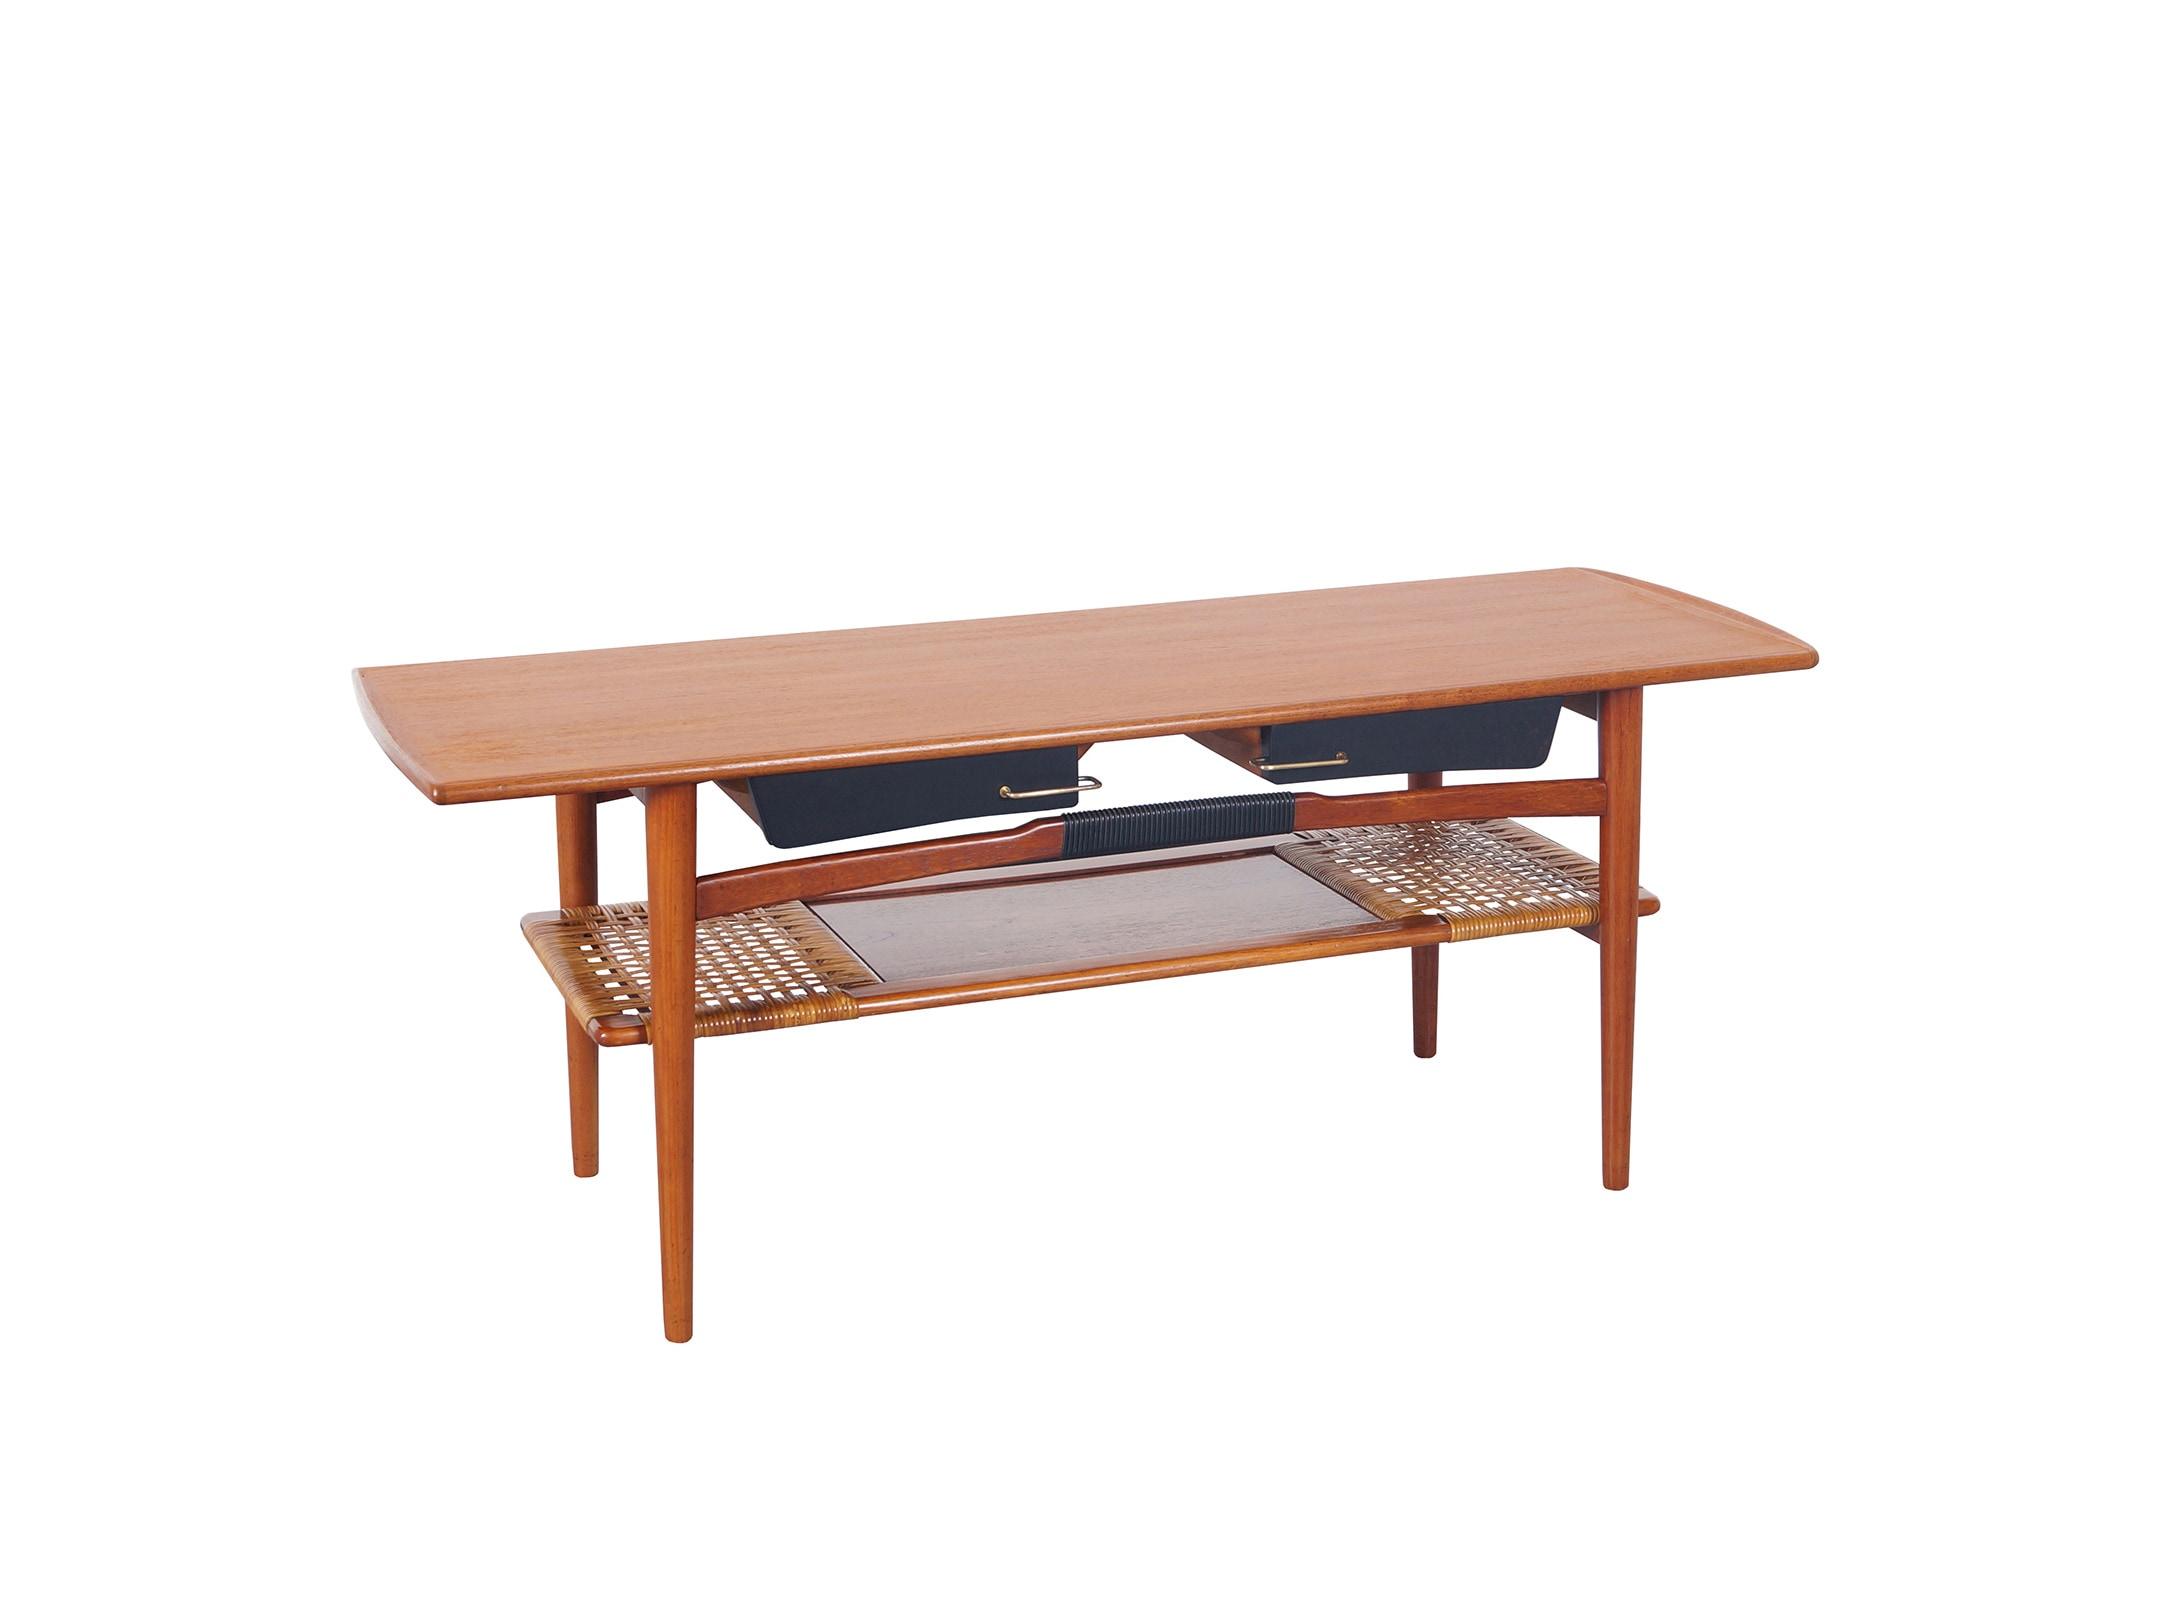 Danish Modern Teak Coffee Table